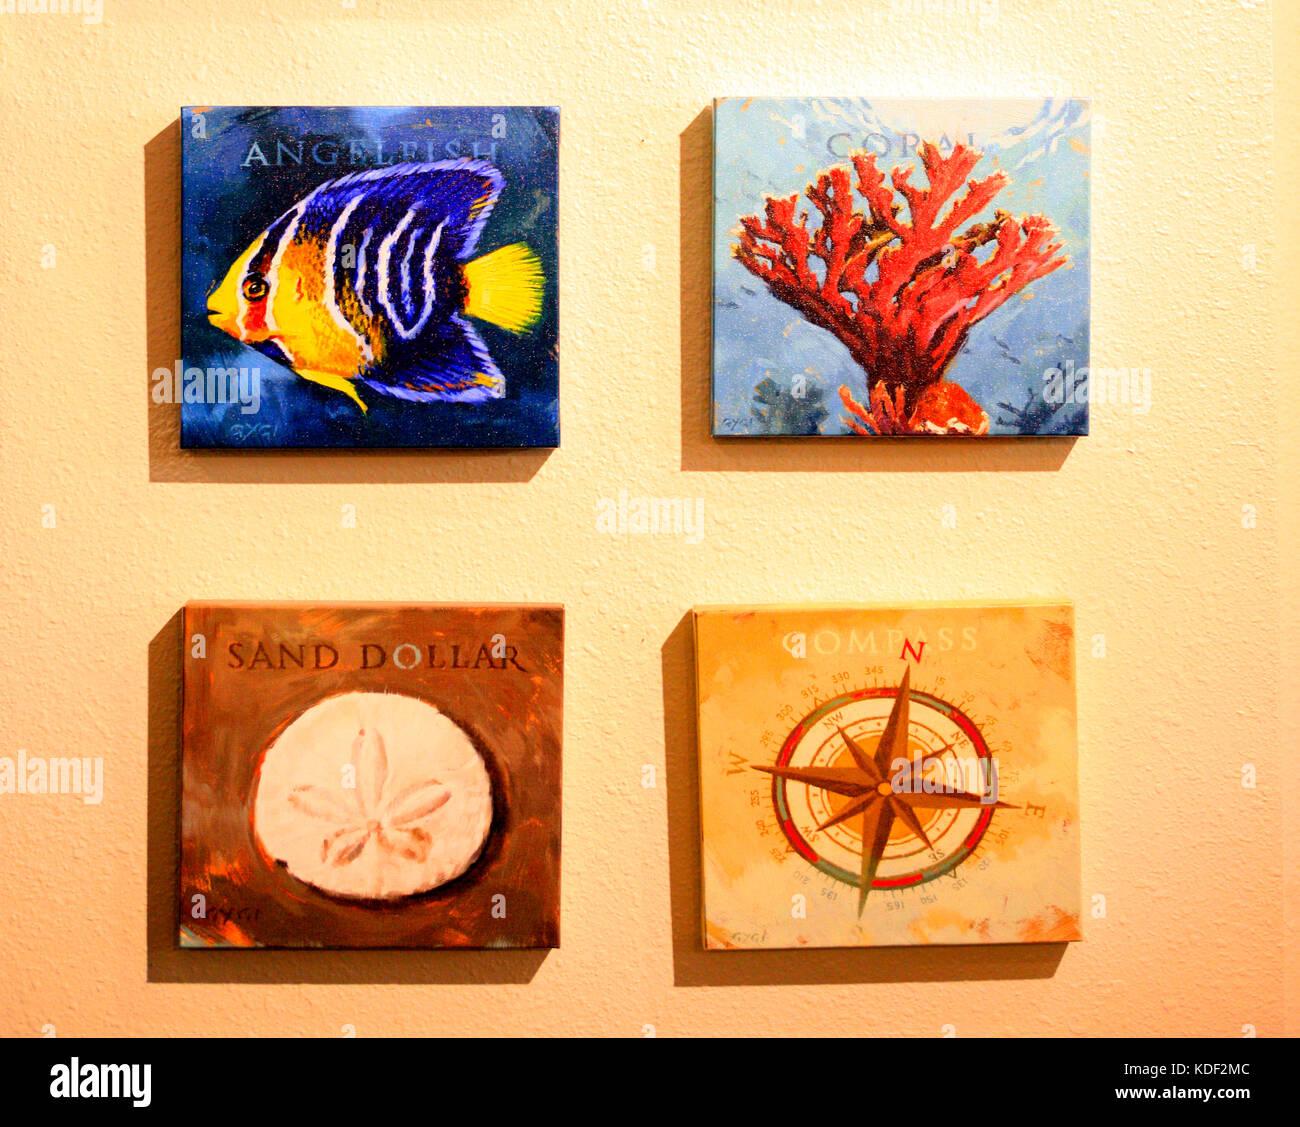 Fantastic Sand Dollar Wall Decor Ideas - The Wall Art Decorations ...